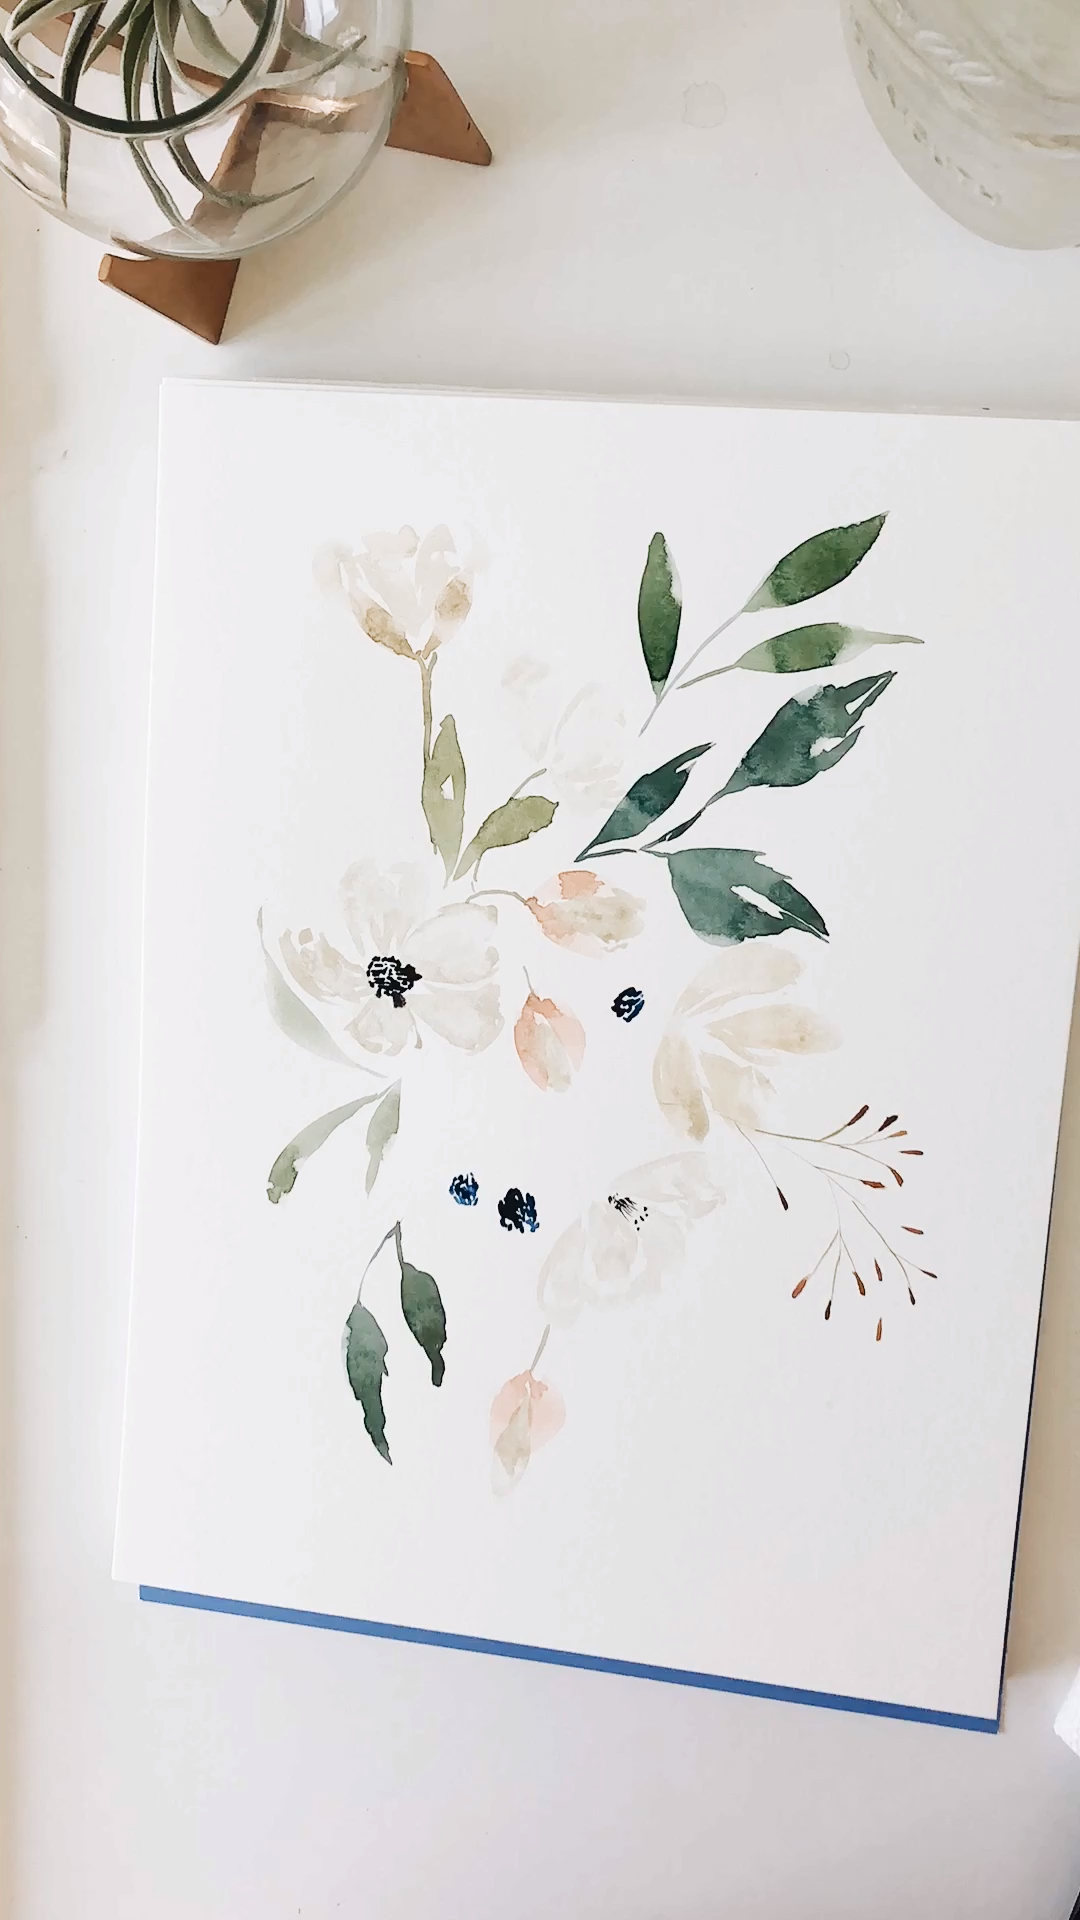 Photo of Loose Floral Watercolor Process Video by Leah Bisch Studio Watercolor Art | wate …